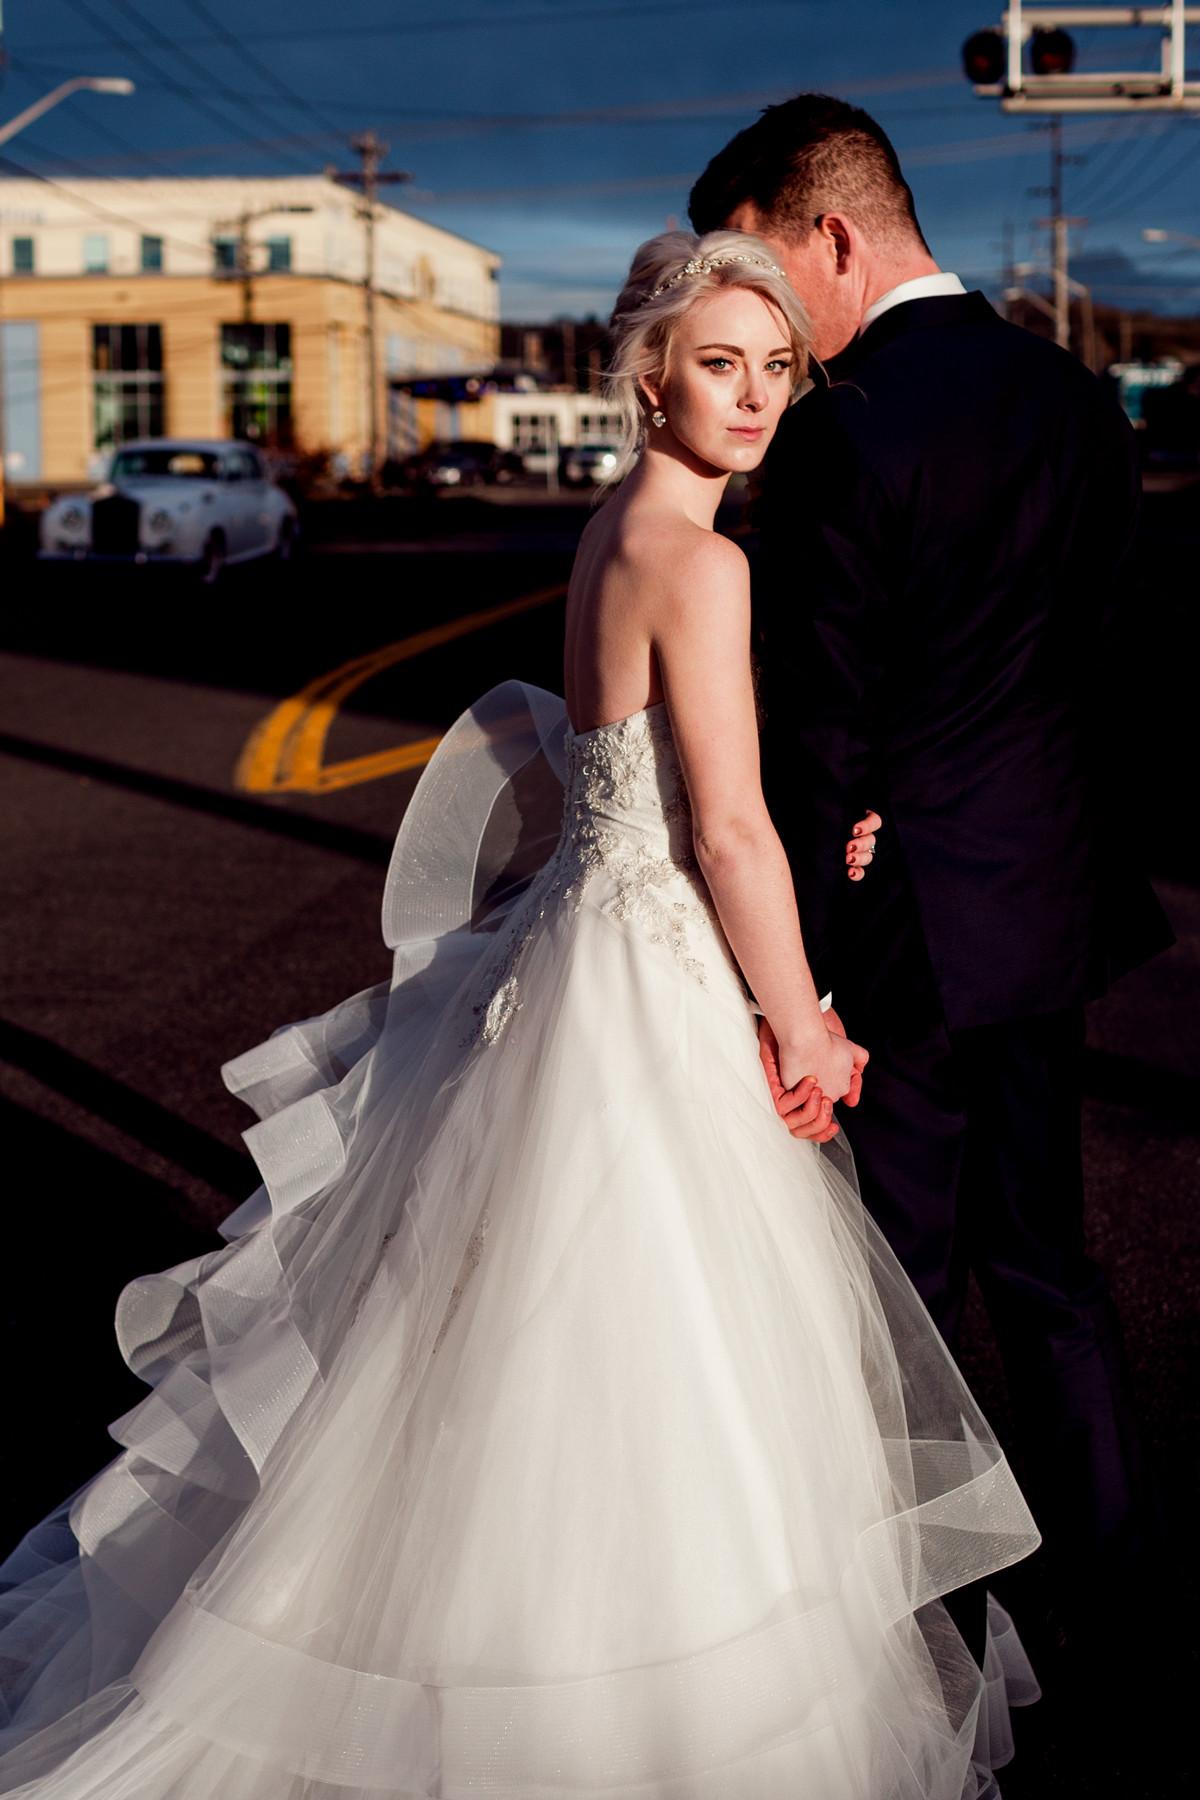 Sunlit portrait of blonde bride - photo by John and Joseph - Los Angeles